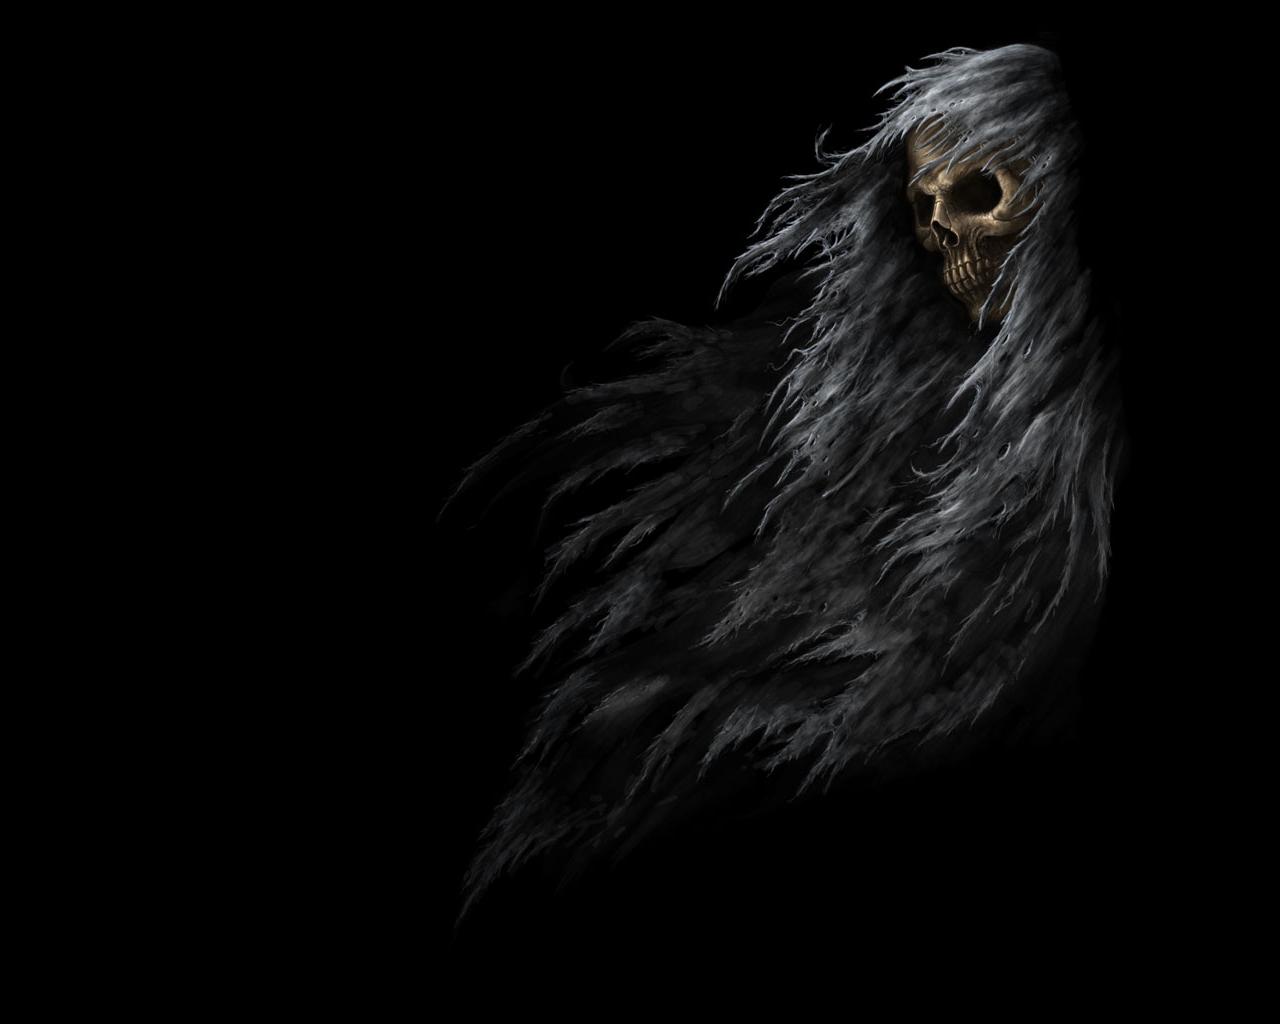 PicturesPool Skull Wallpapers Skeleton Wallpapers 3DWallpapers 1280x1024